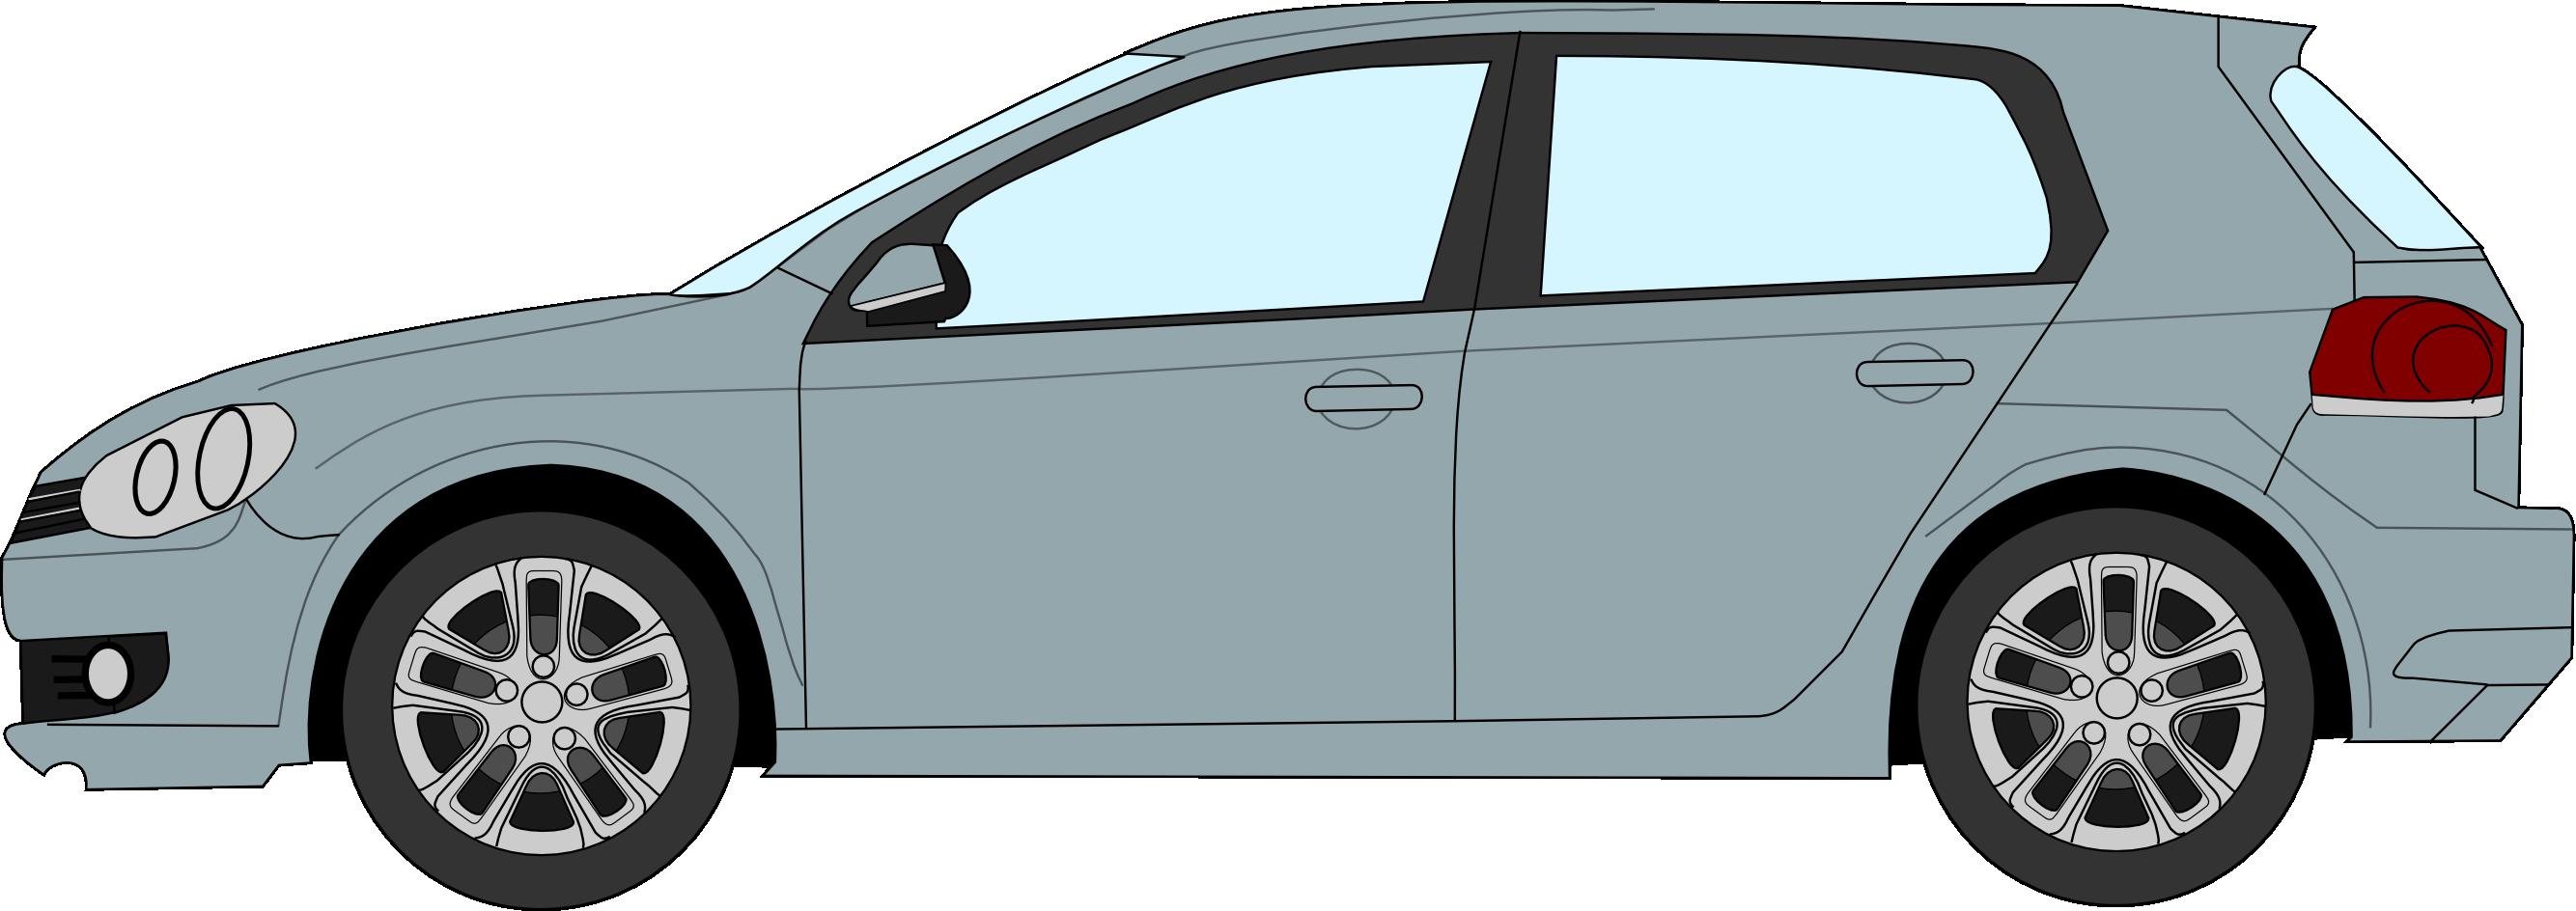 Car profile at getdrawings. Golfer clipart pencil drawing